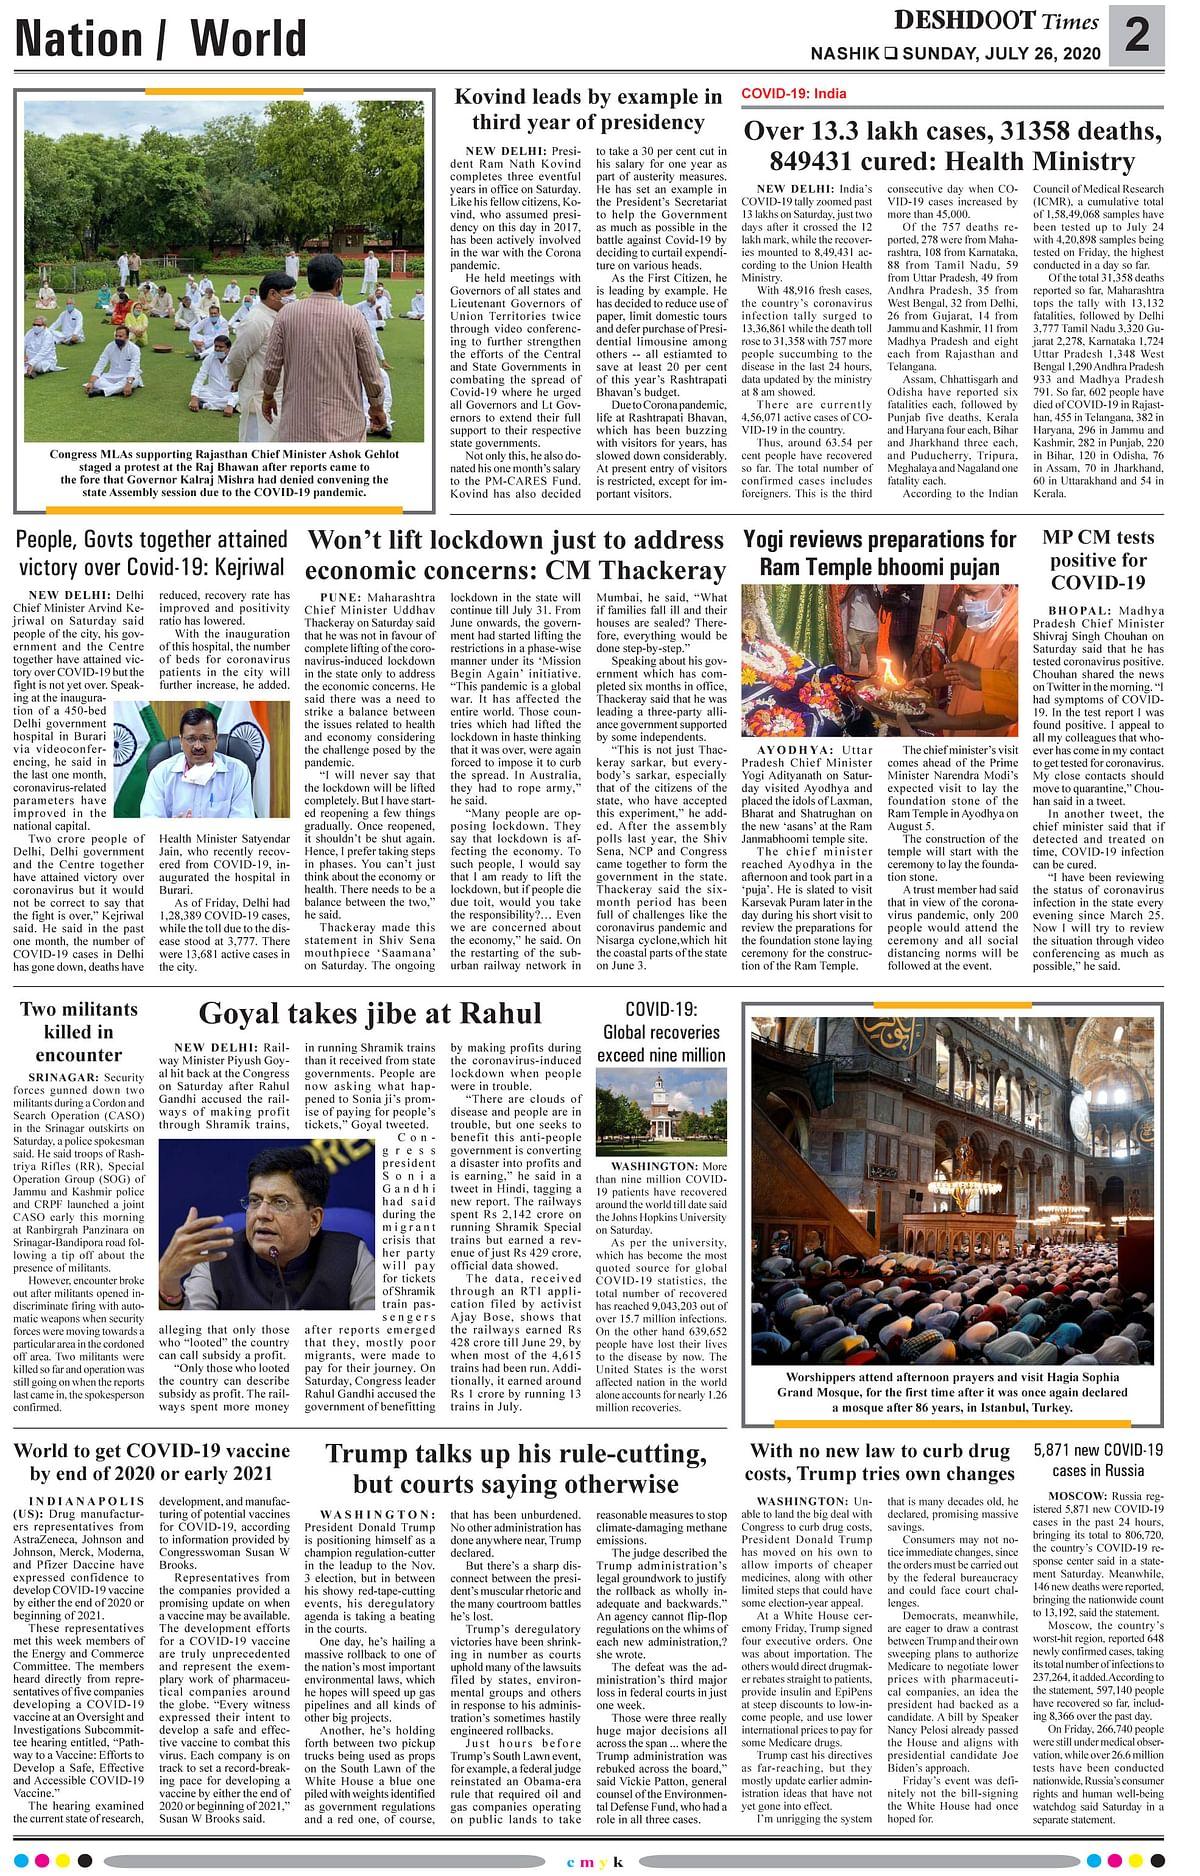 Deshdoot Times E Paper, 26 July 2020